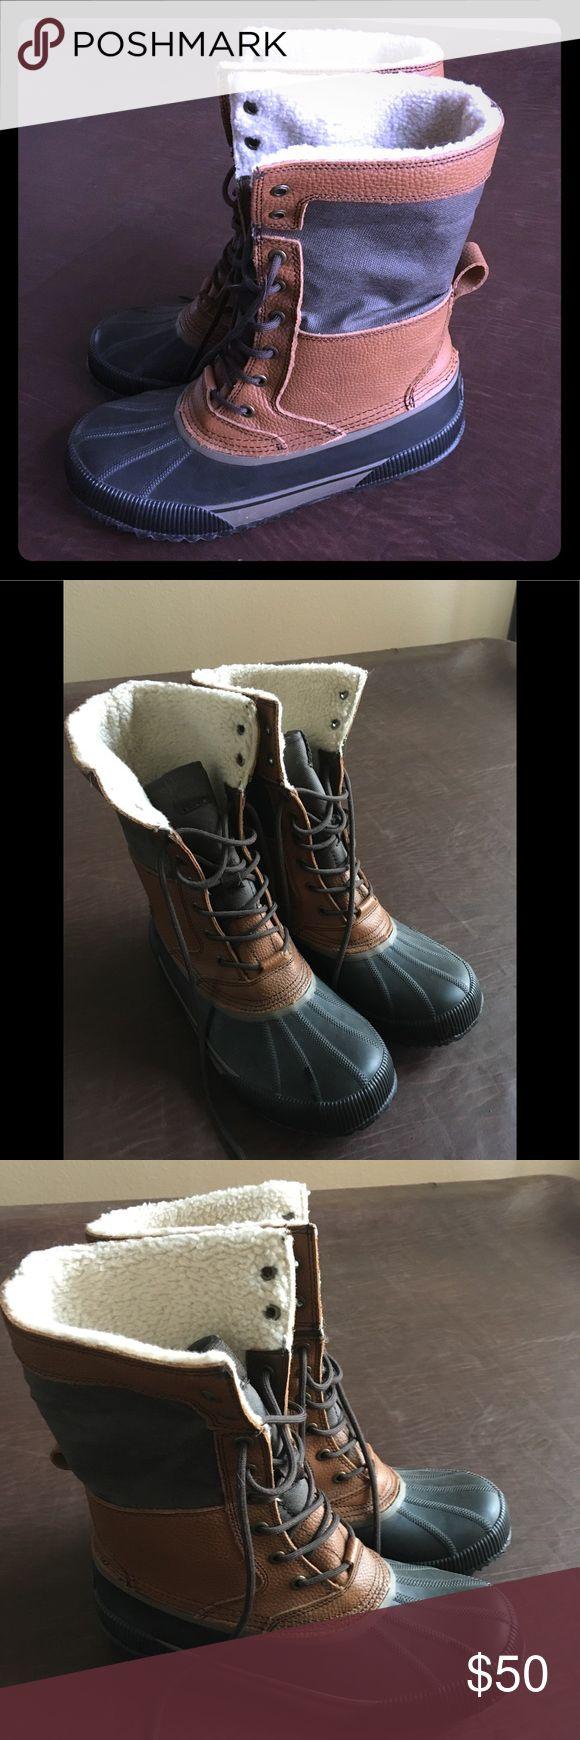 Mens Boots Mens Aldo boots Aldo Shoes Rain & Snow Boots